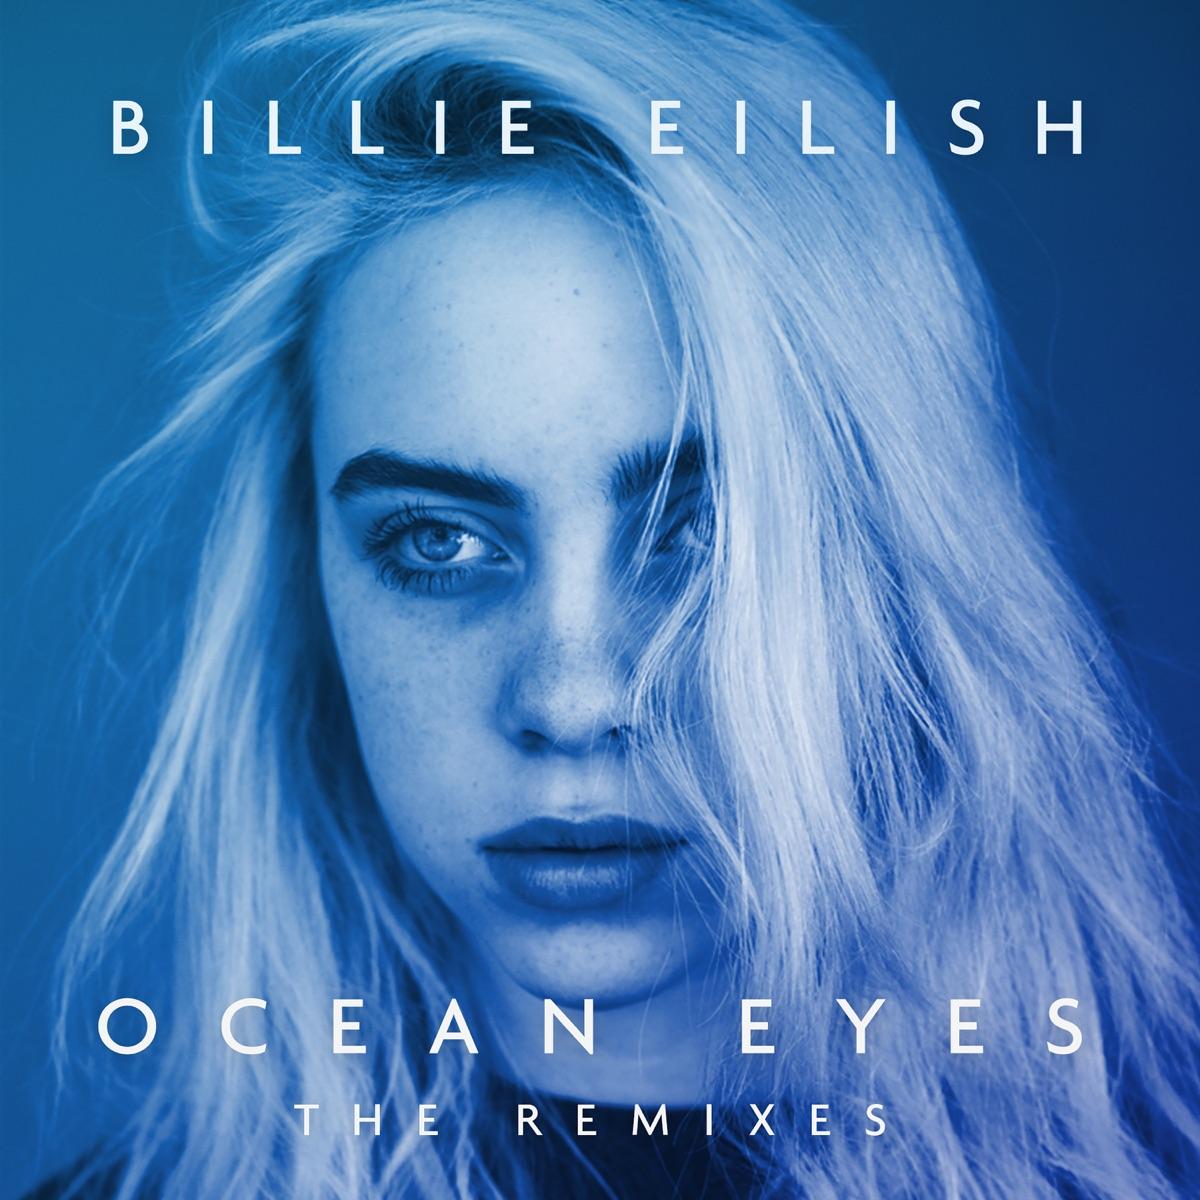 Ocean Eyes The Remixes - EP Billie Eilish CD cover